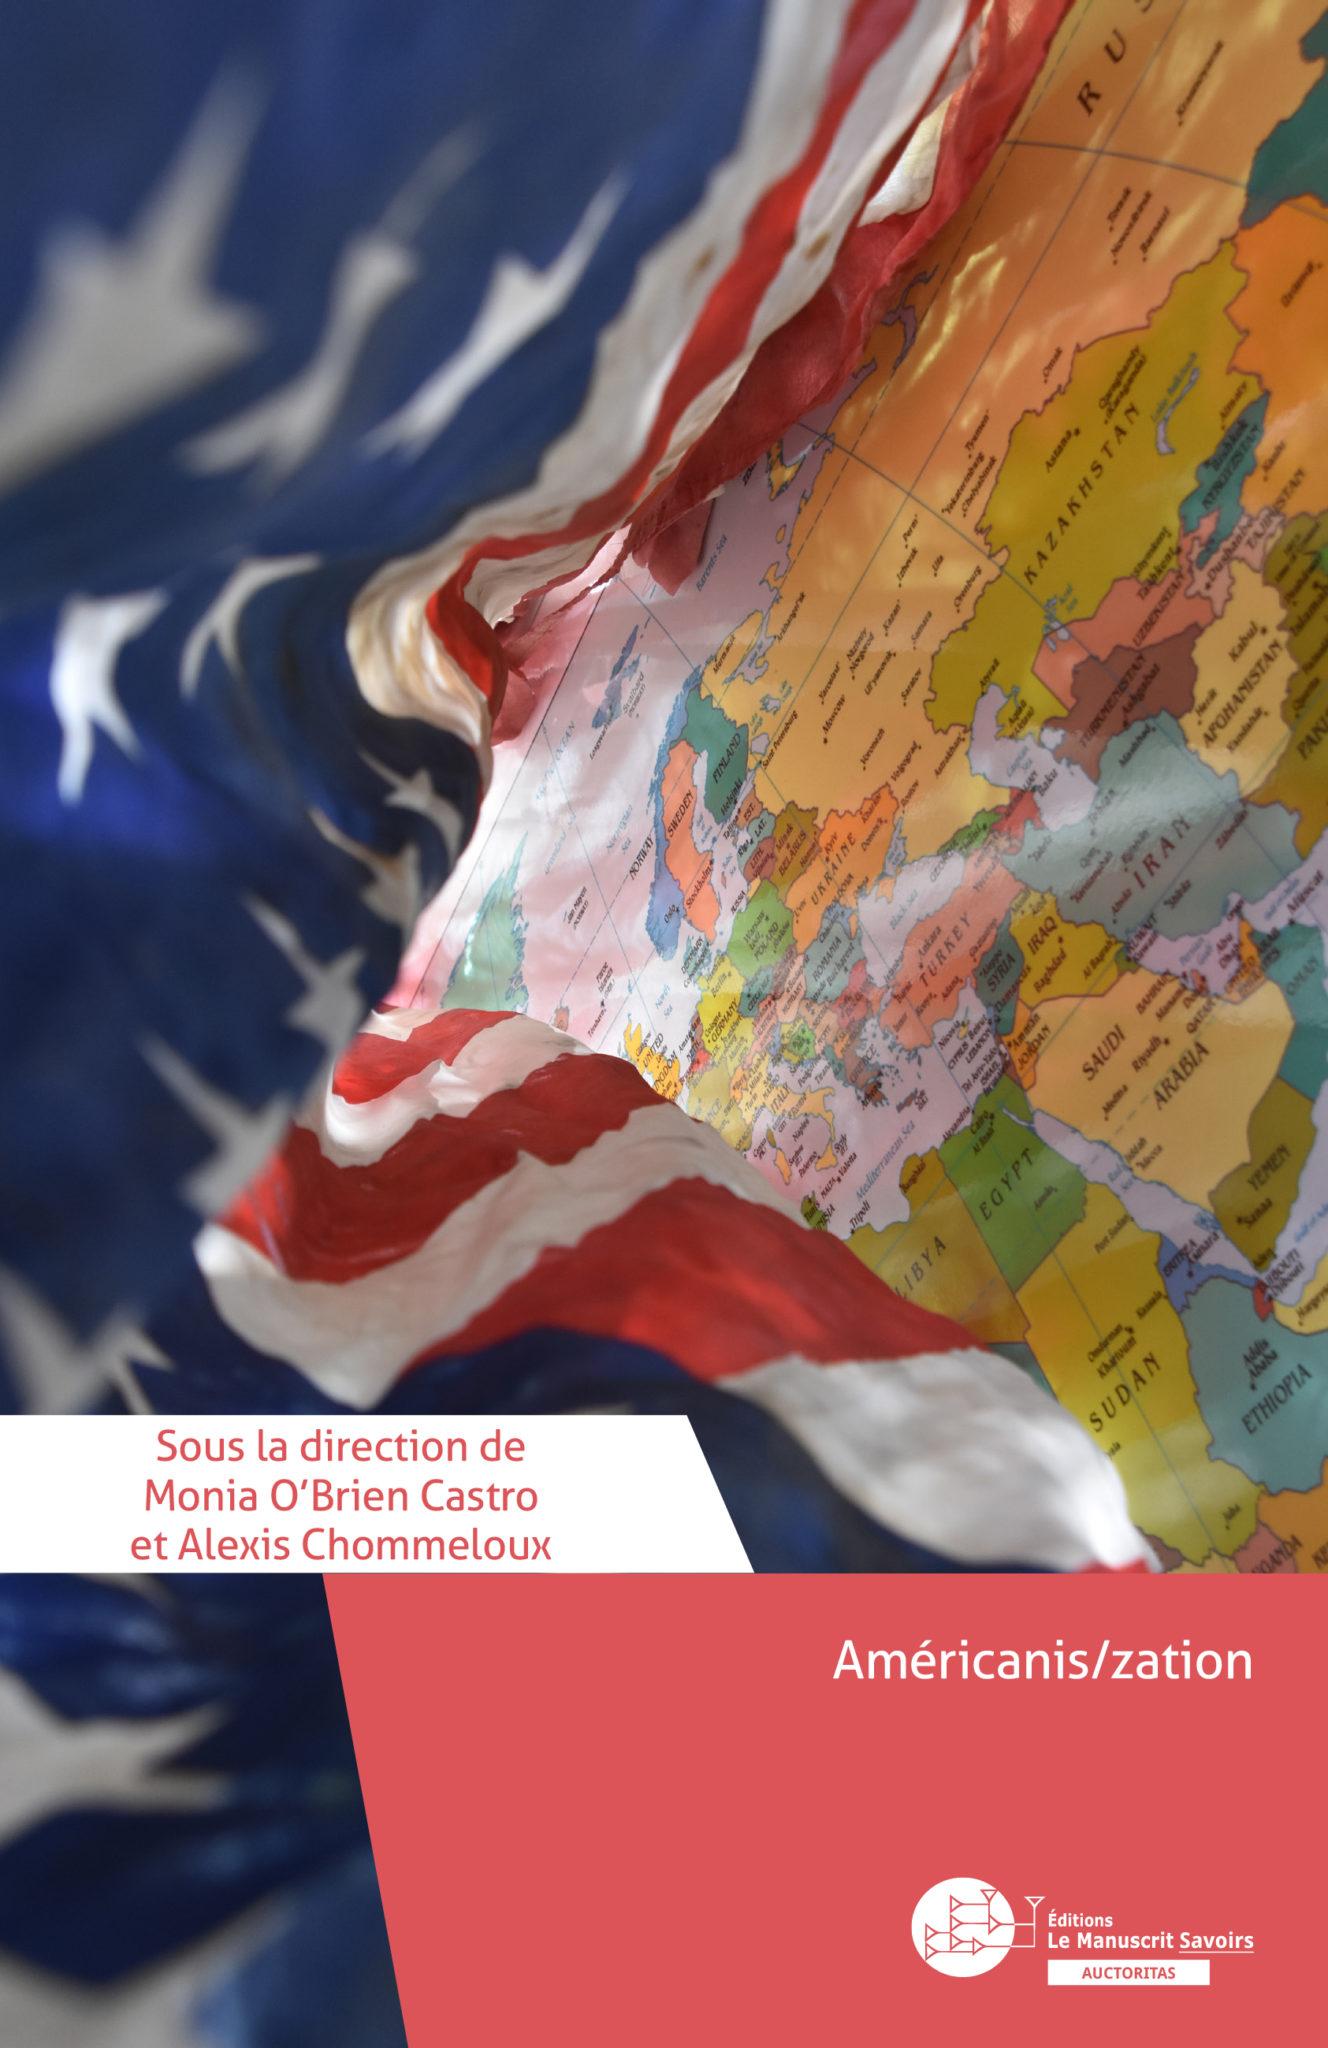 Americanisation